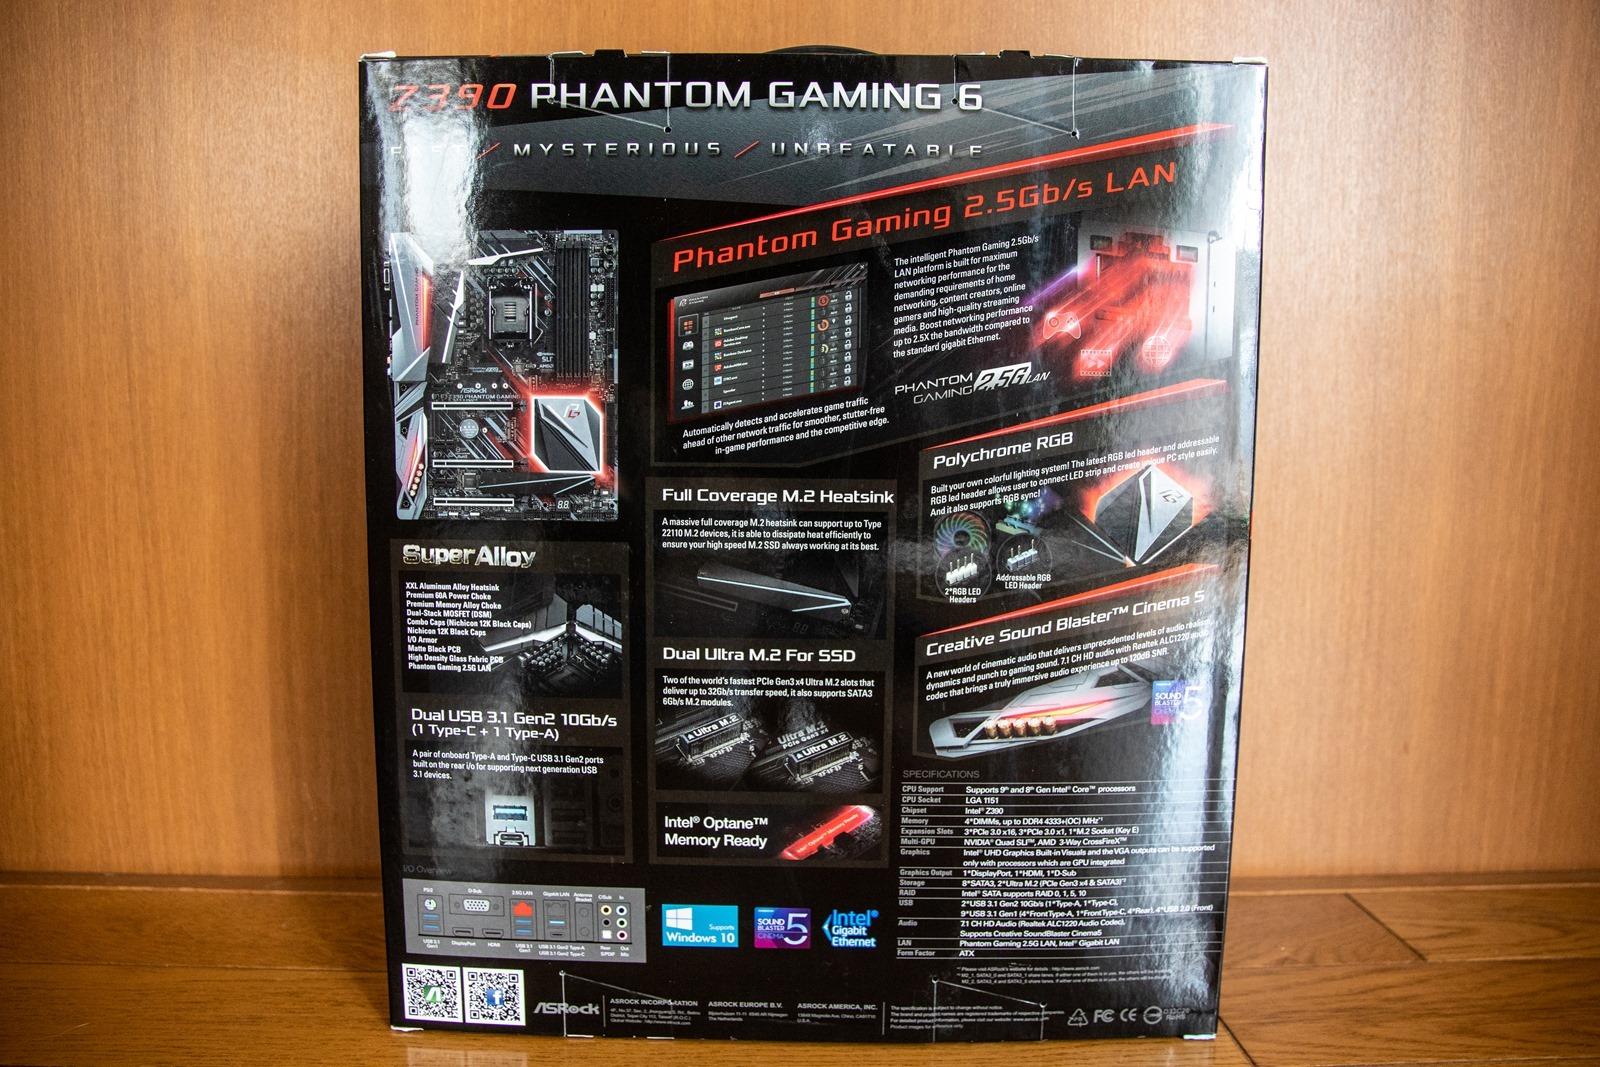 ASROCK Z390 Phantom Gaming 6 主機板開箱 旗艦用料與配置,價格也更親民 @3C 達人廖阿輝